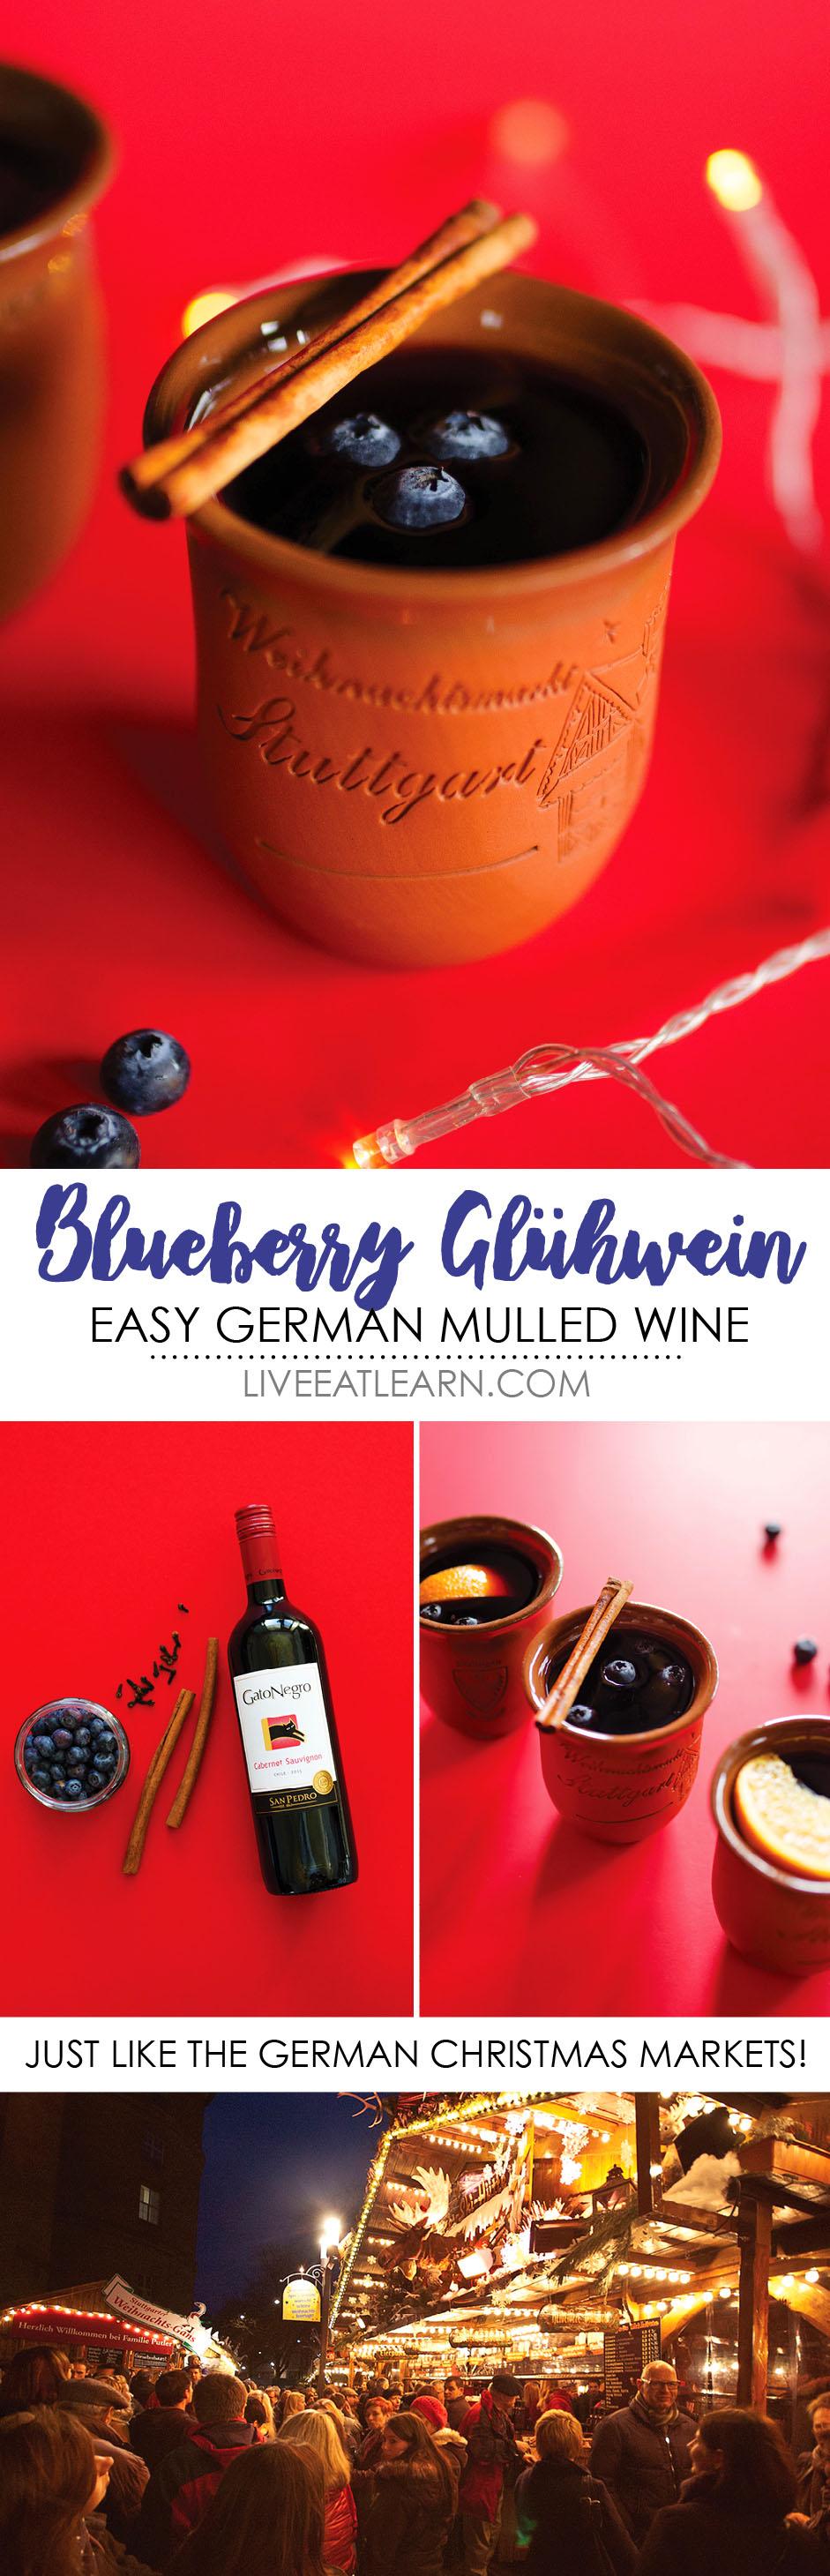 Blueberry Gluhwein Recipe Recipe Gluhwein Recipe Gluhwein German Christmas Markets